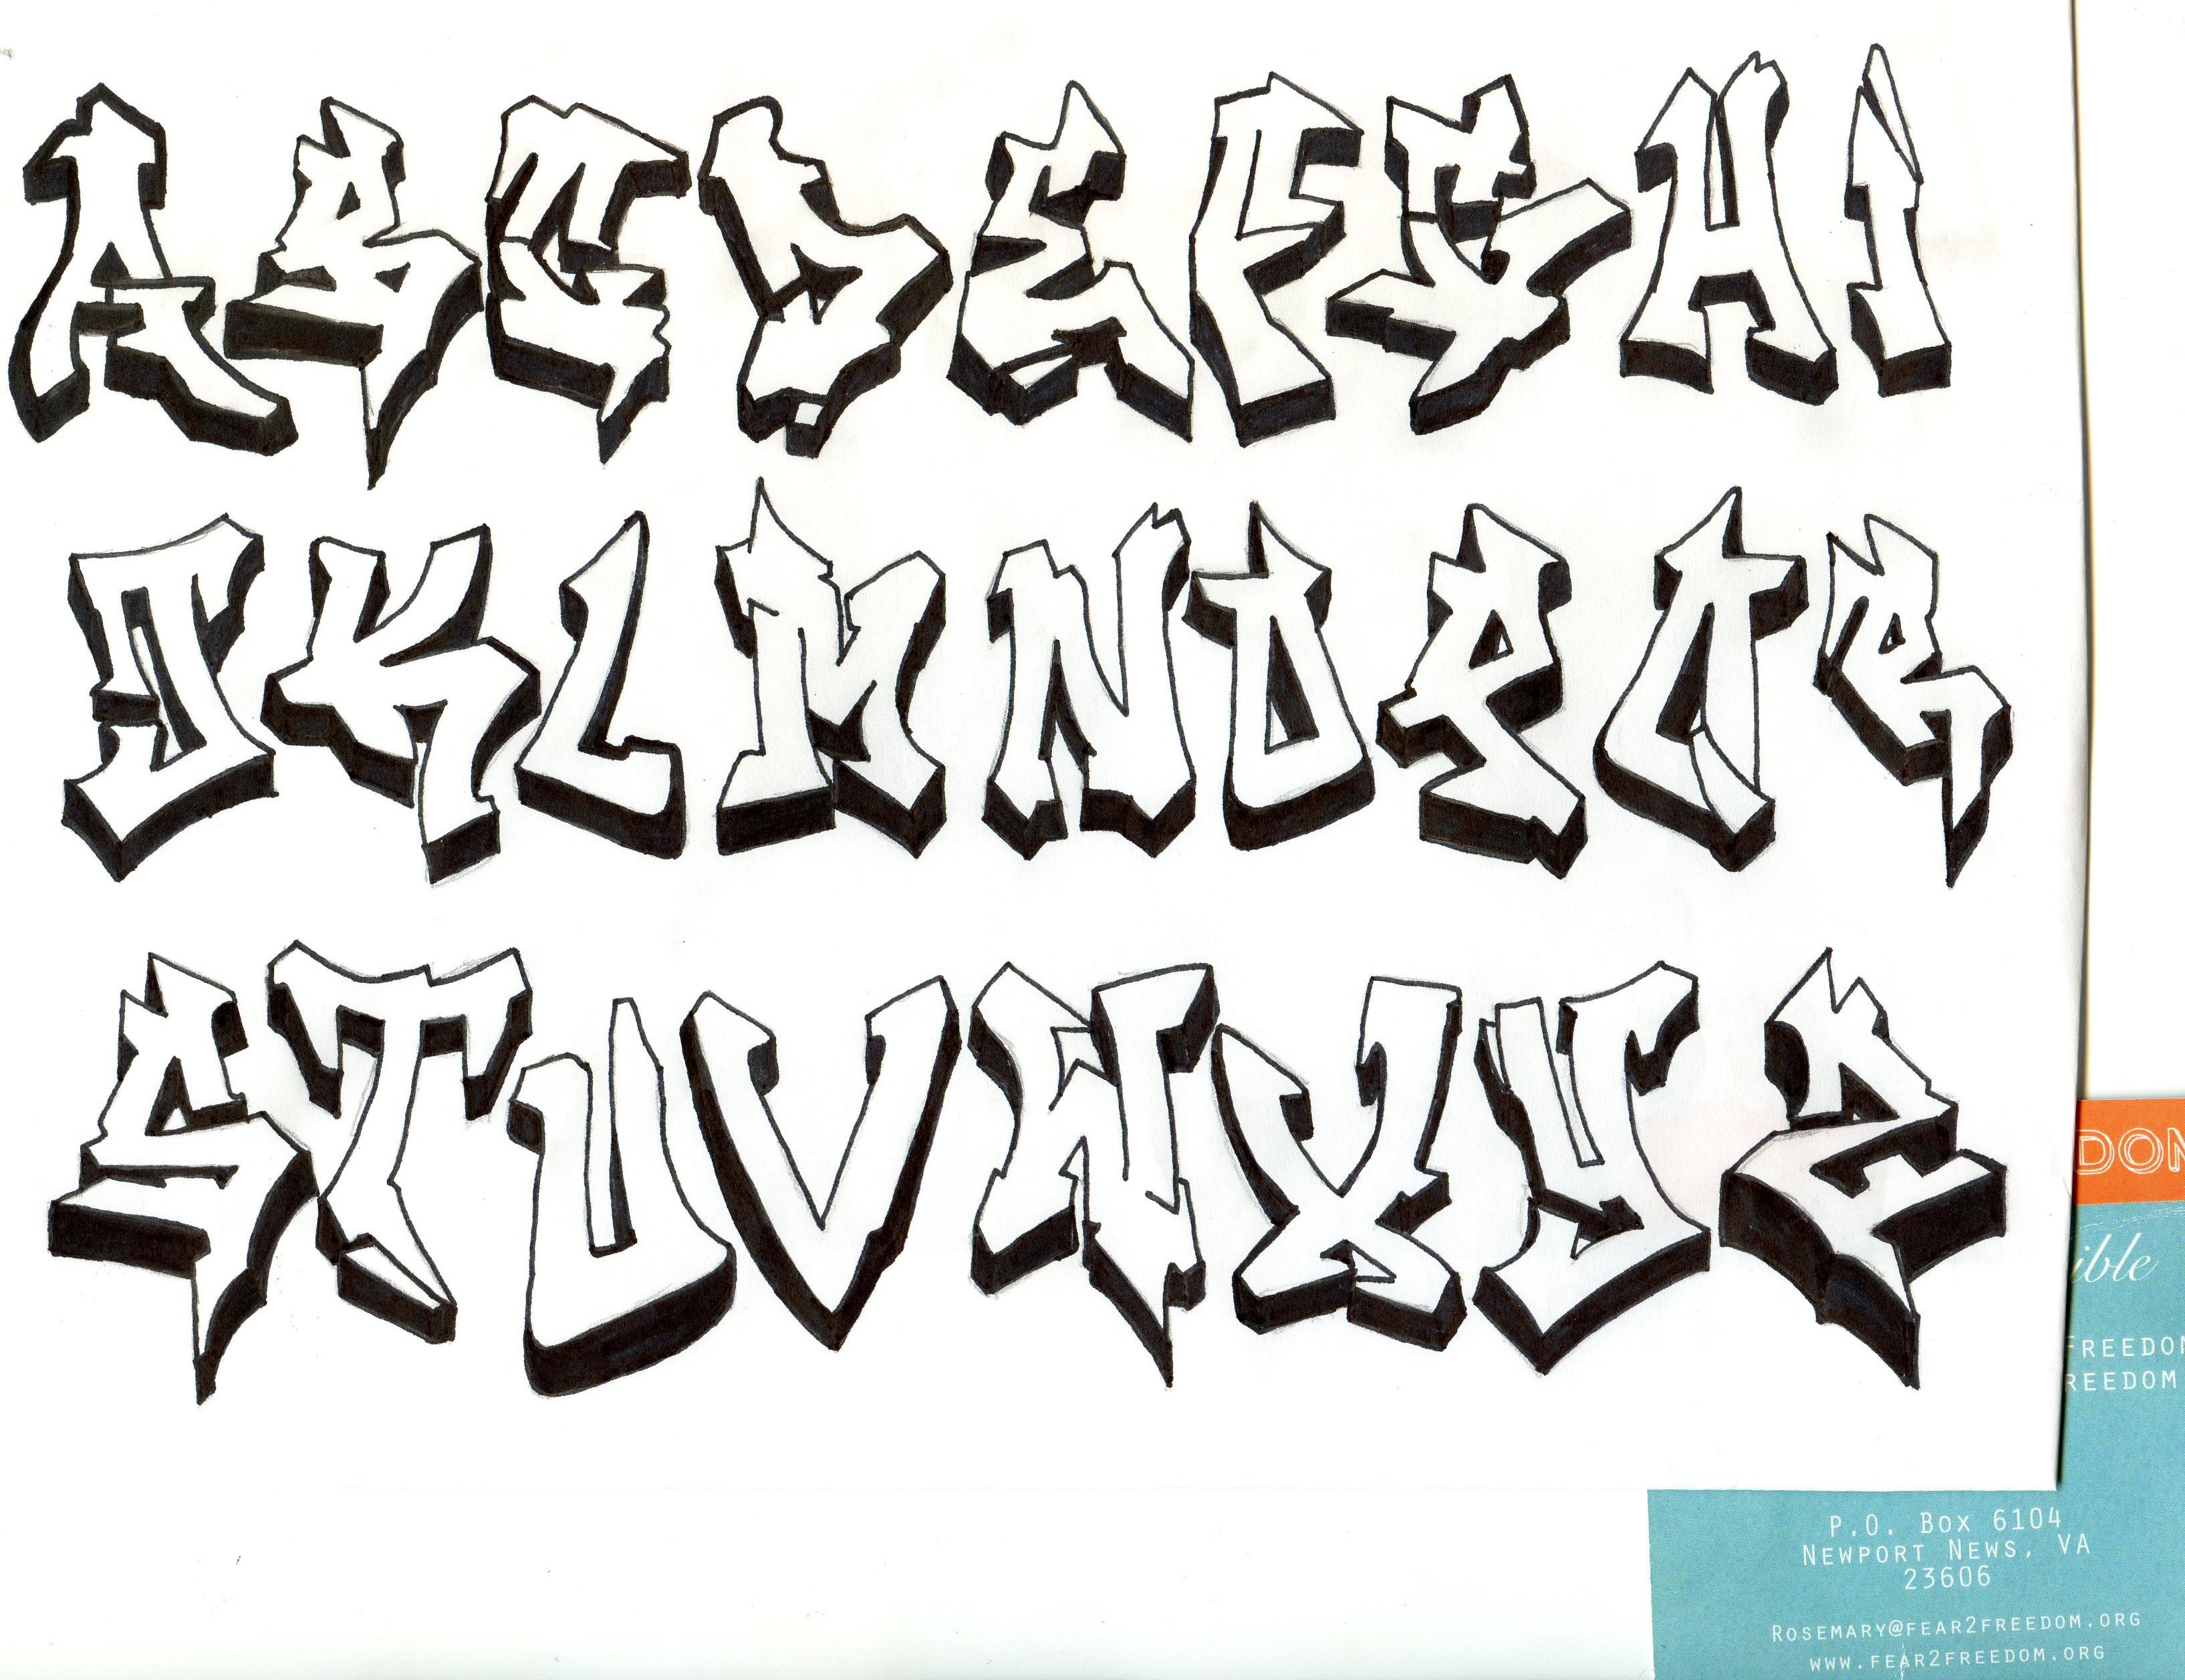 3269x2514 Fancy Graffiti Drawings How To Draw Graffiti Letters